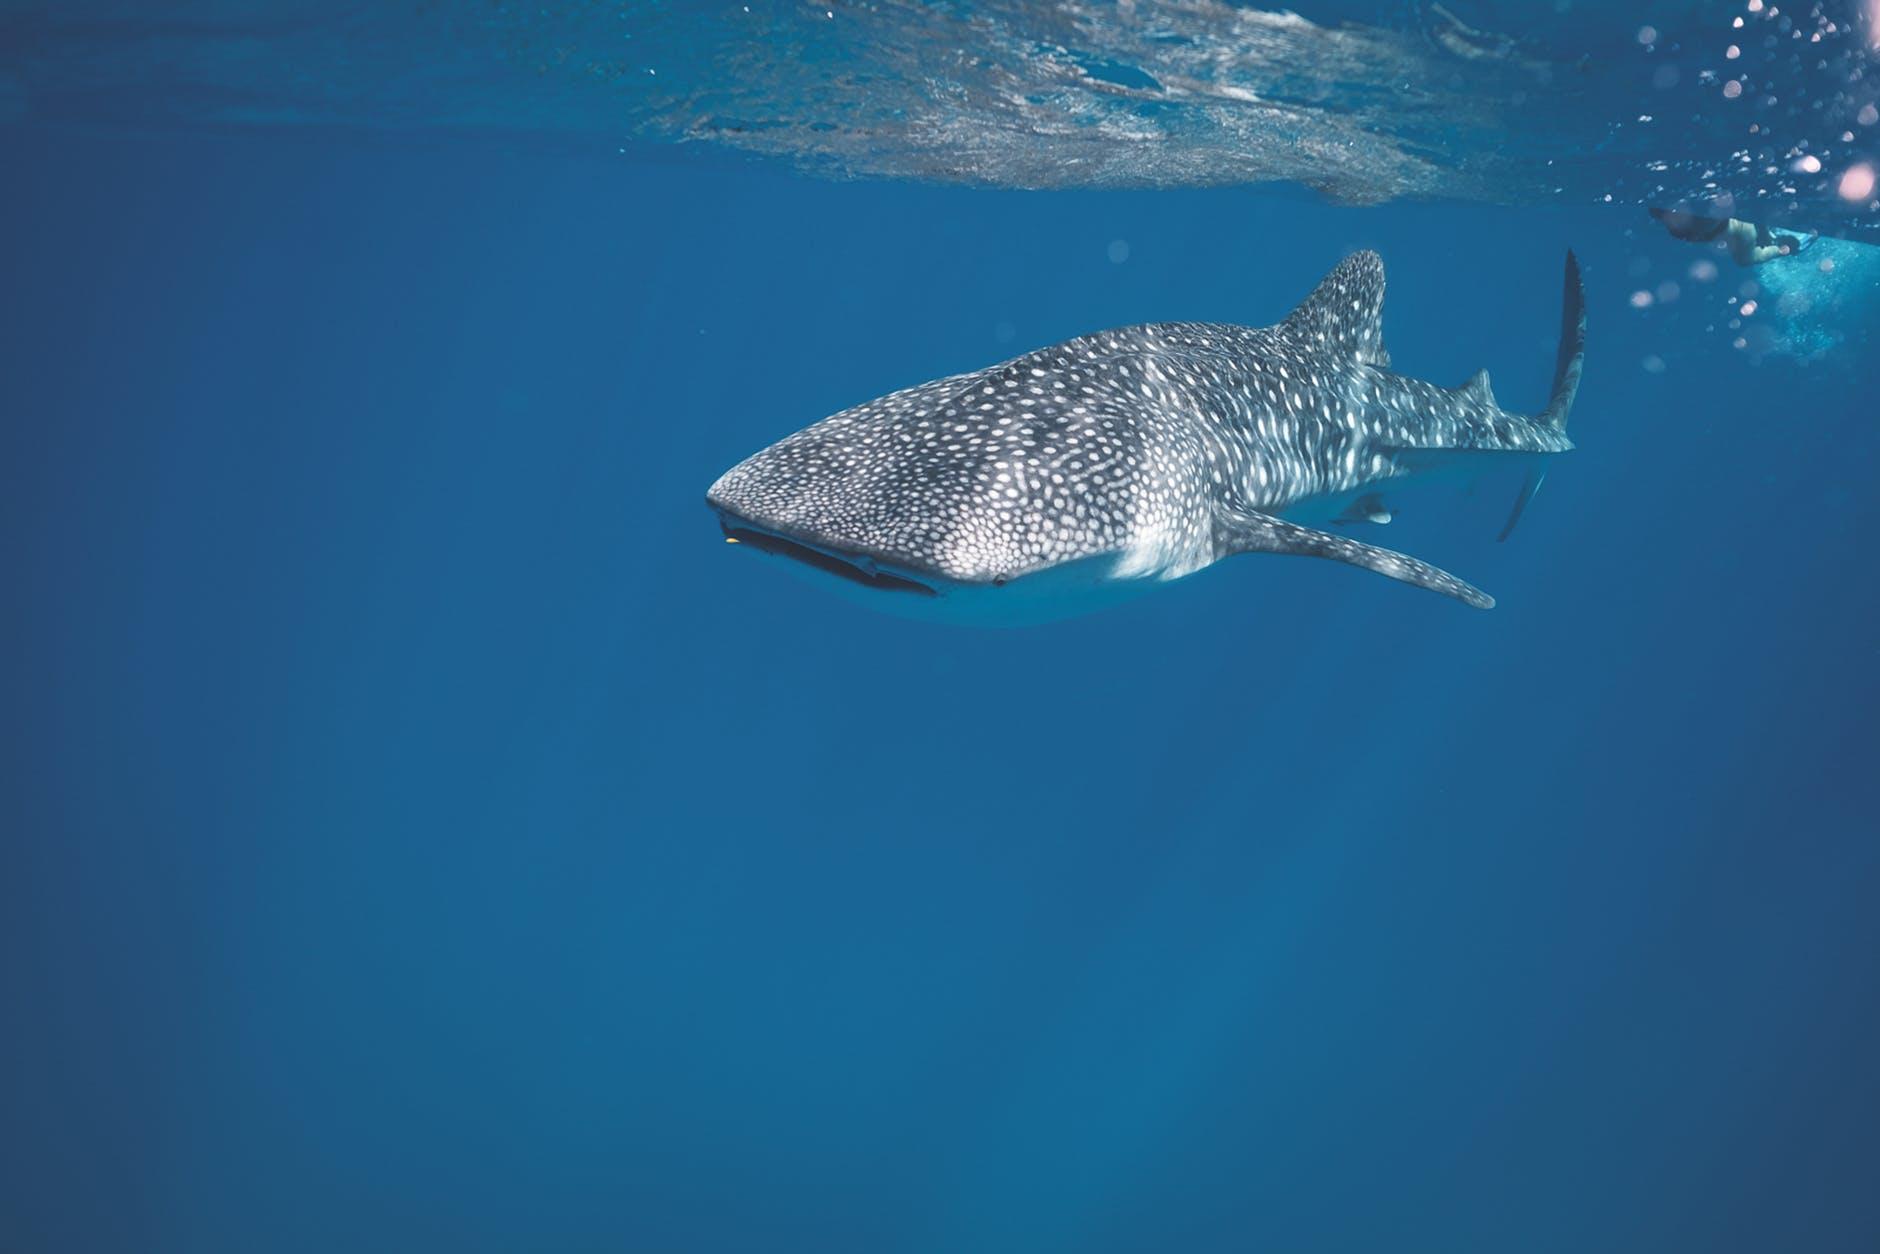 dangerous shark swimming underwater of sea